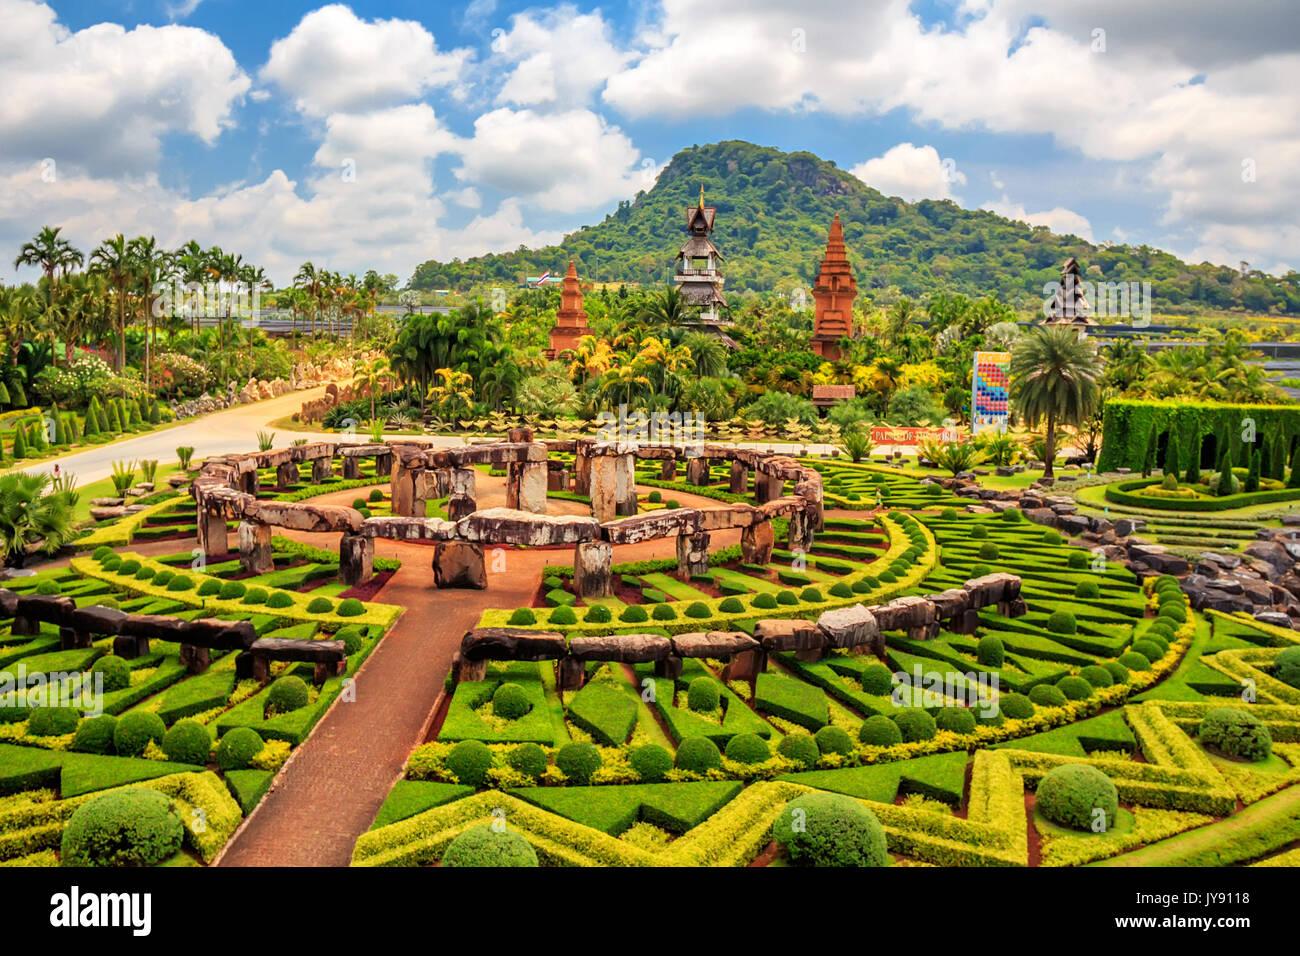 PATTAYA, THAILAND - MARCH 2013: Nong Nooch Garden